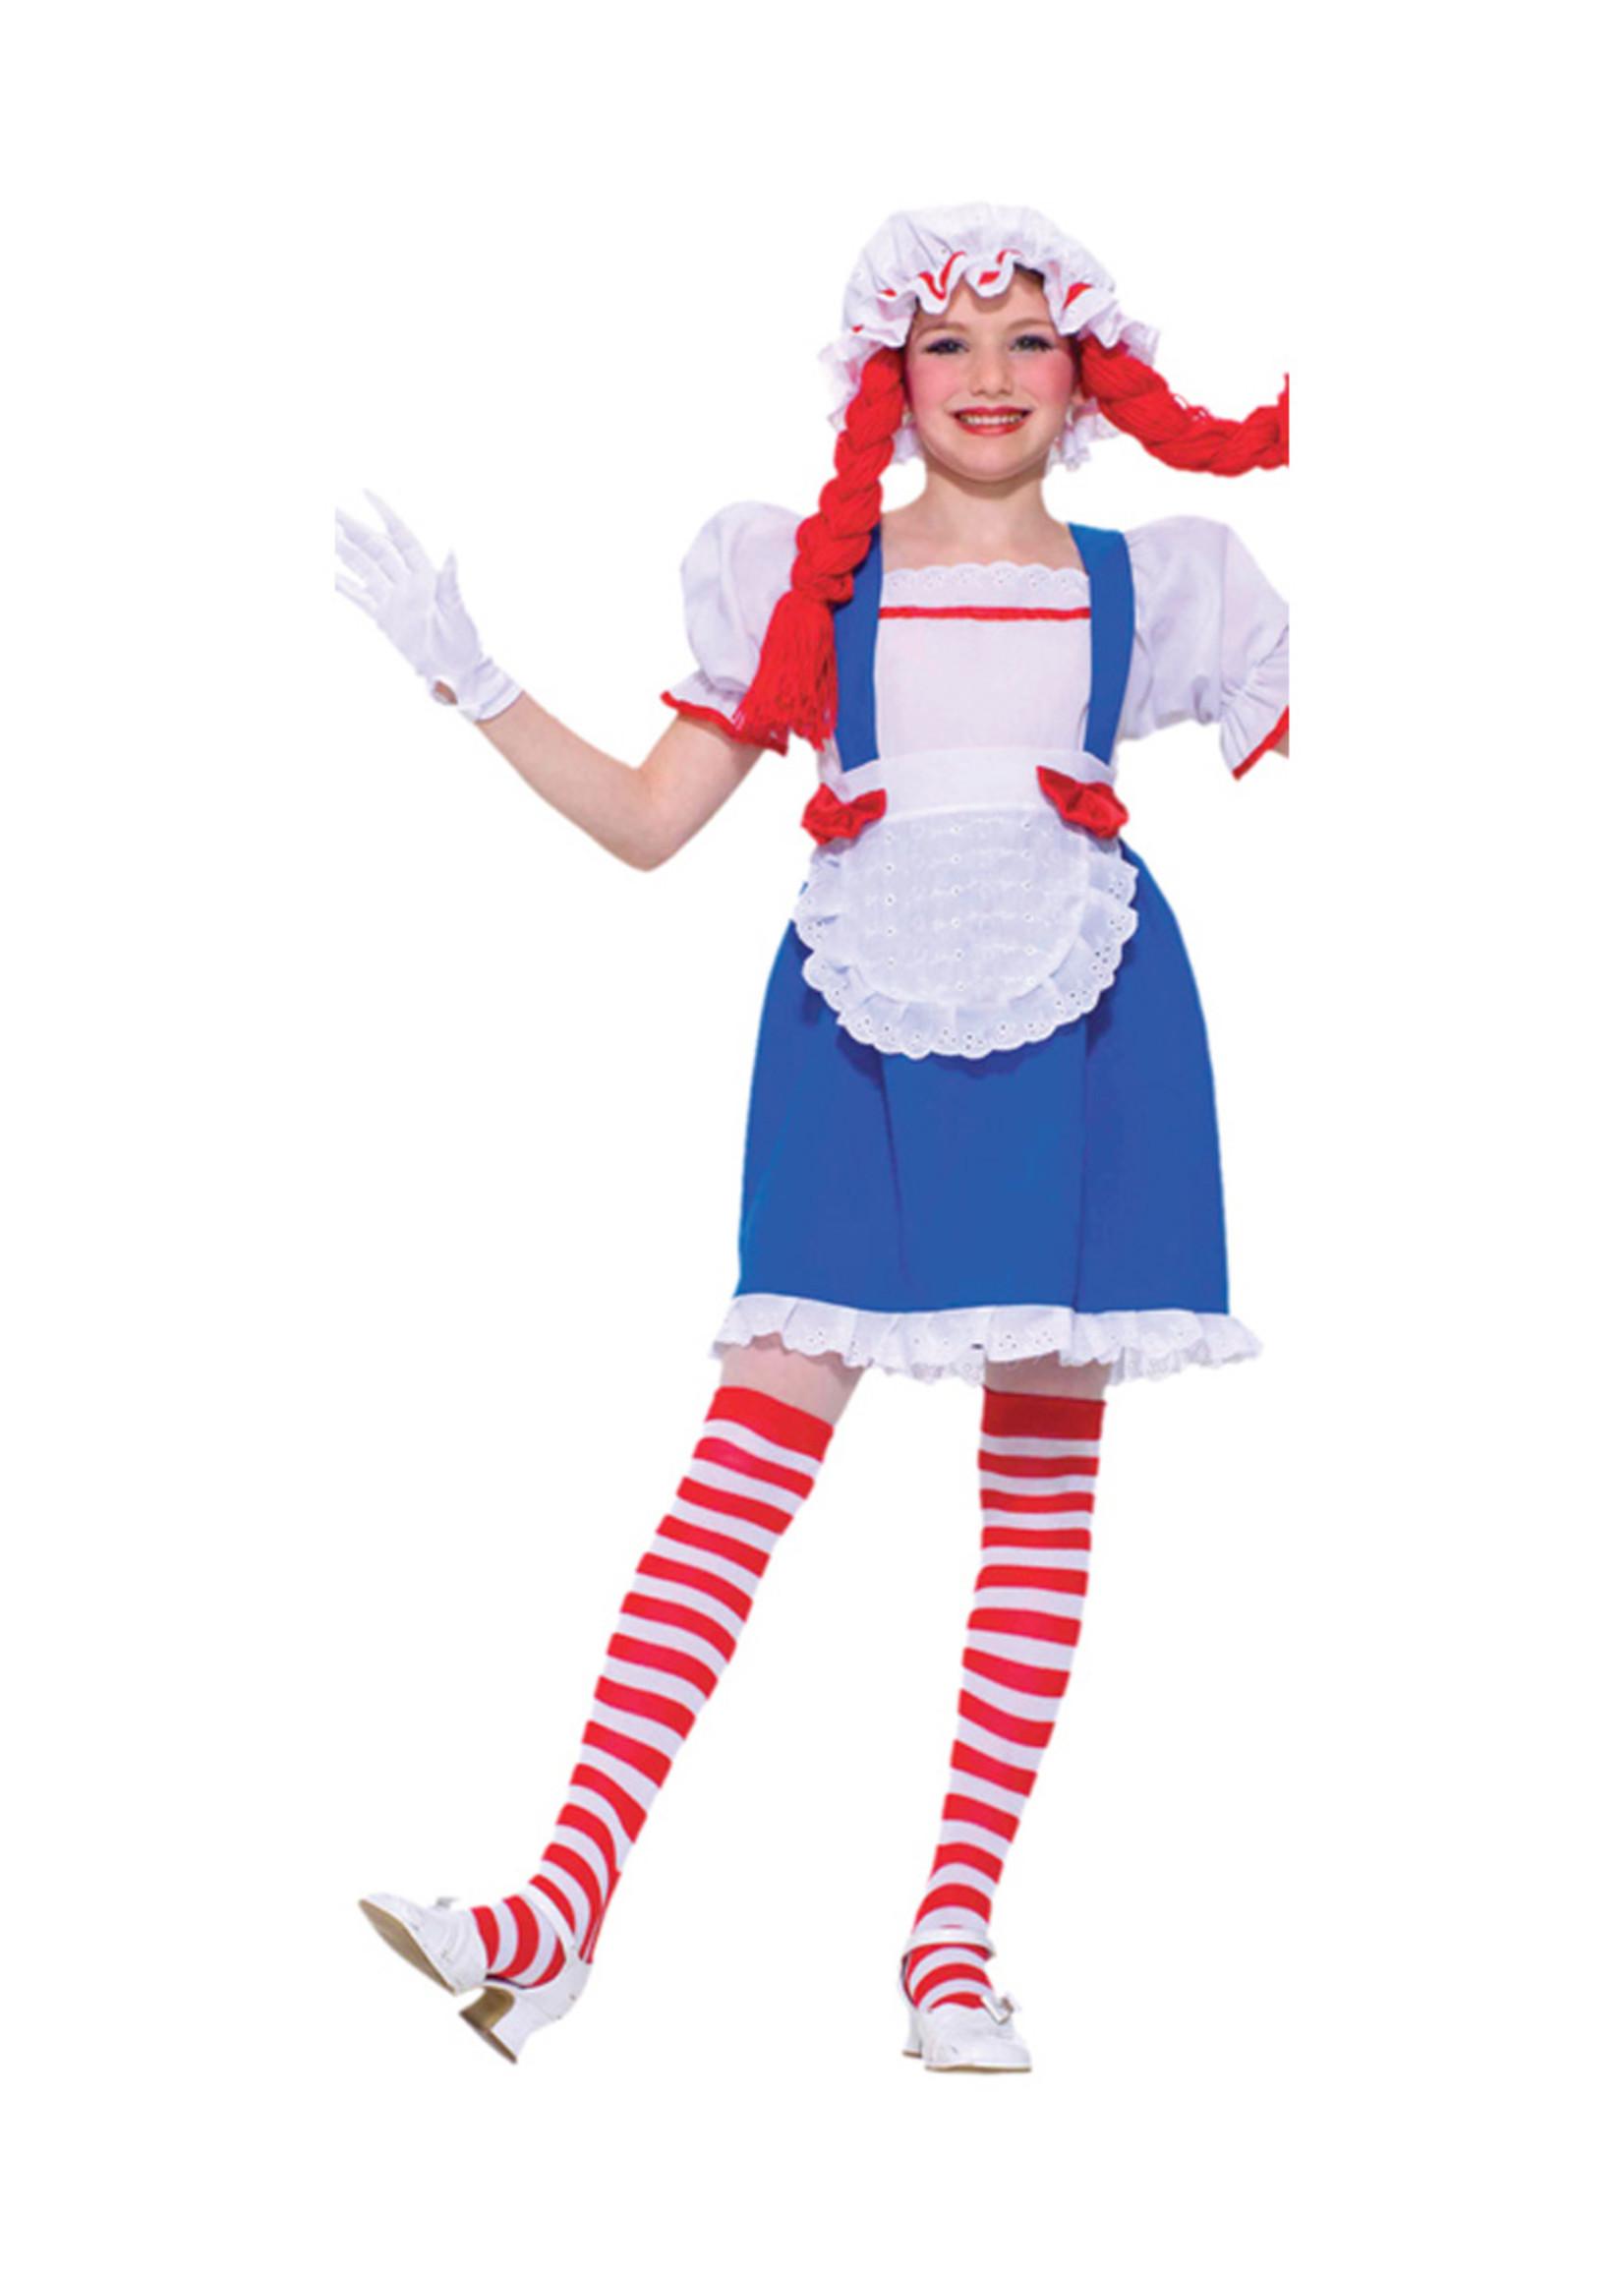 Rag Doll Costume - Girls